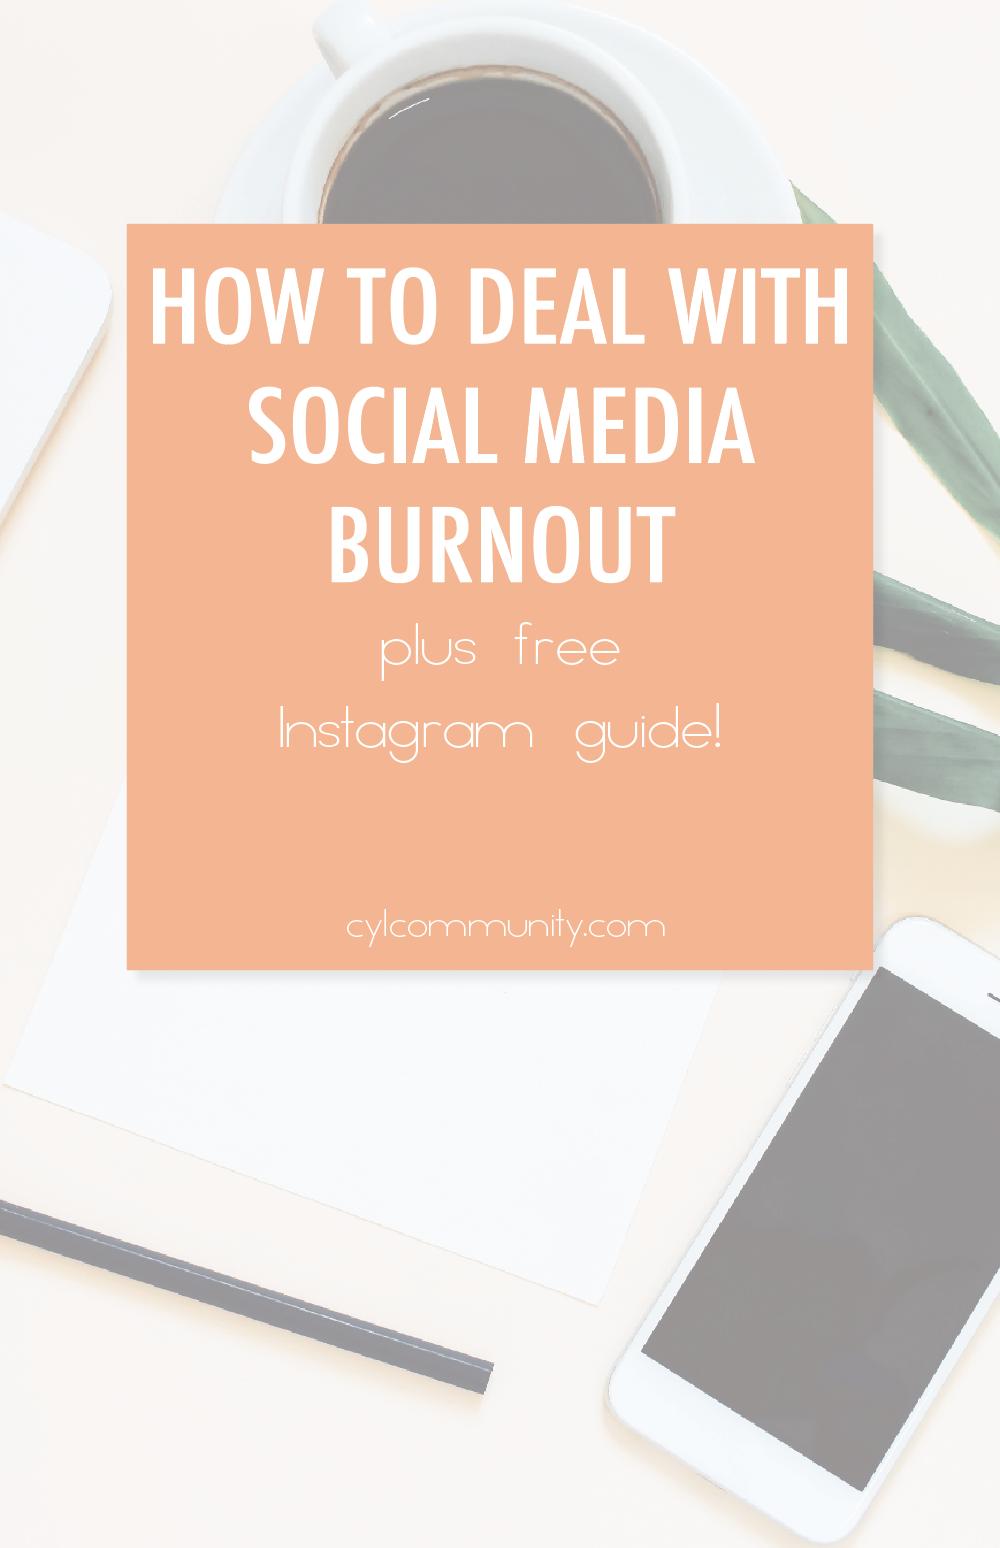 entrepreneur_how_deal_social_media_burnout.png